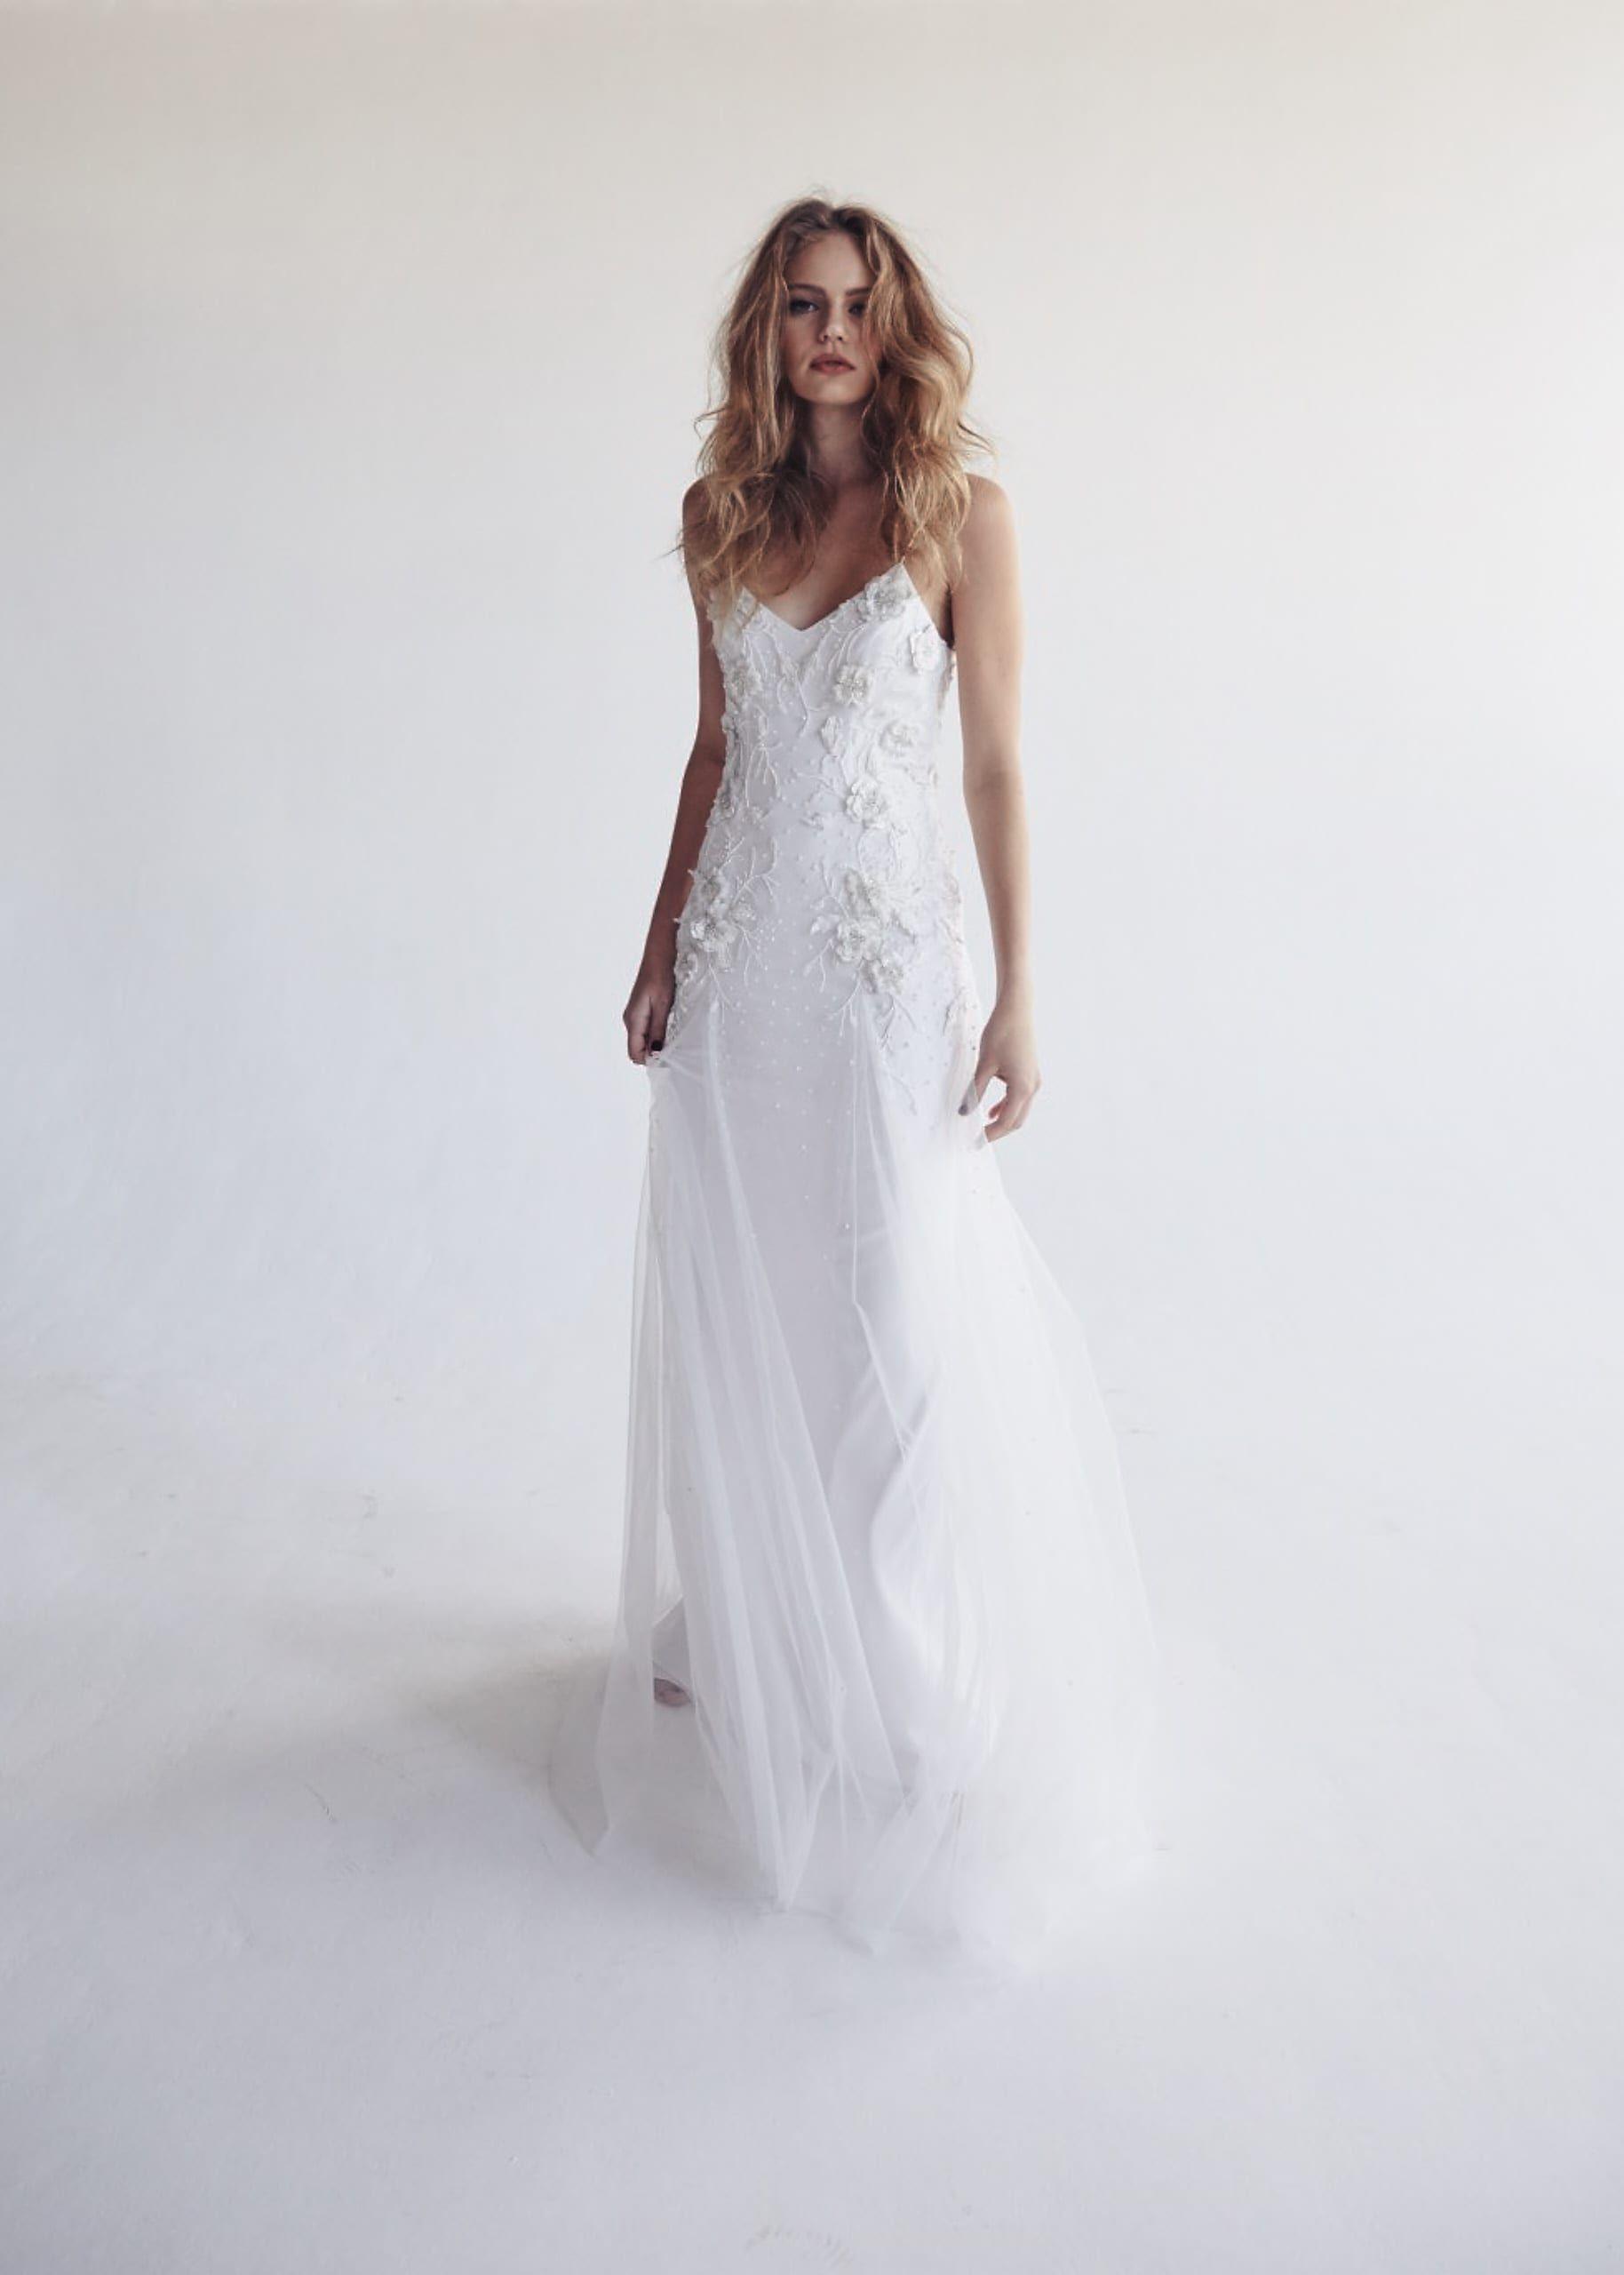 IRIS Bo and Luca in 2020 Bridal dresses, Consignment